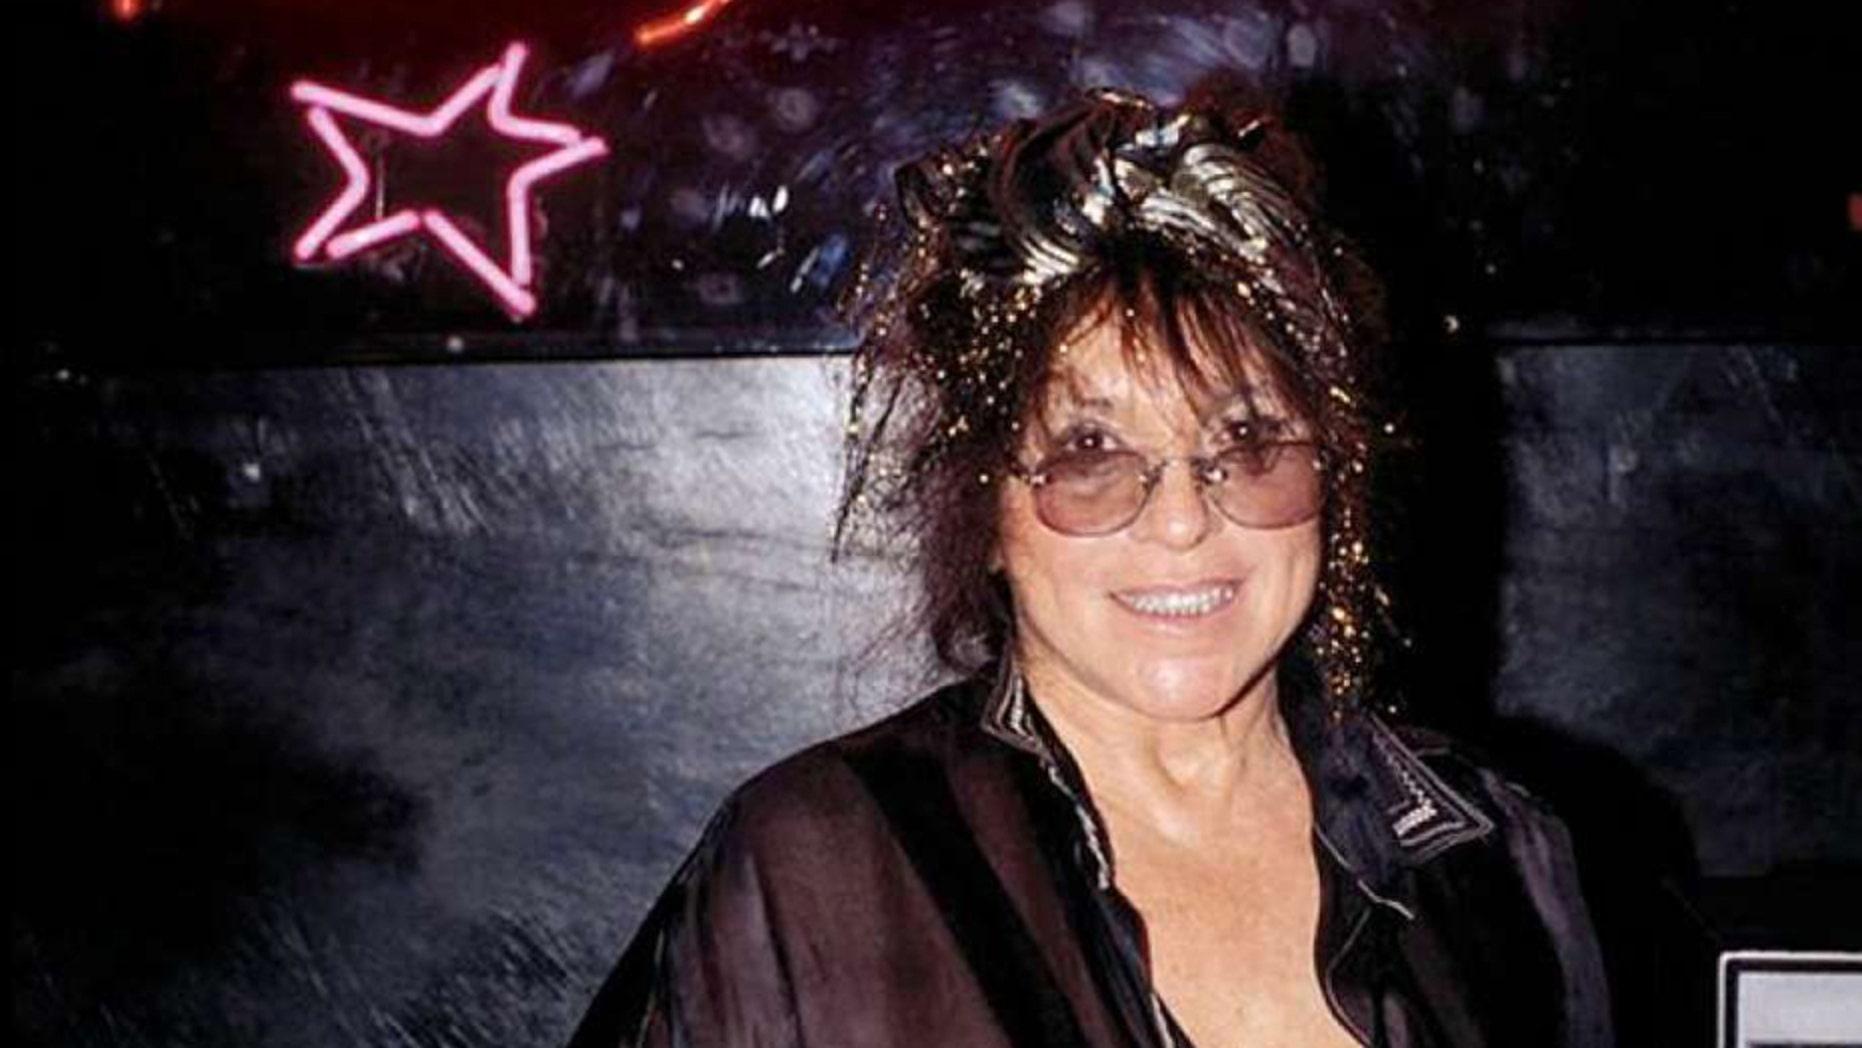 Mitzi Shore has passed away at age 87.